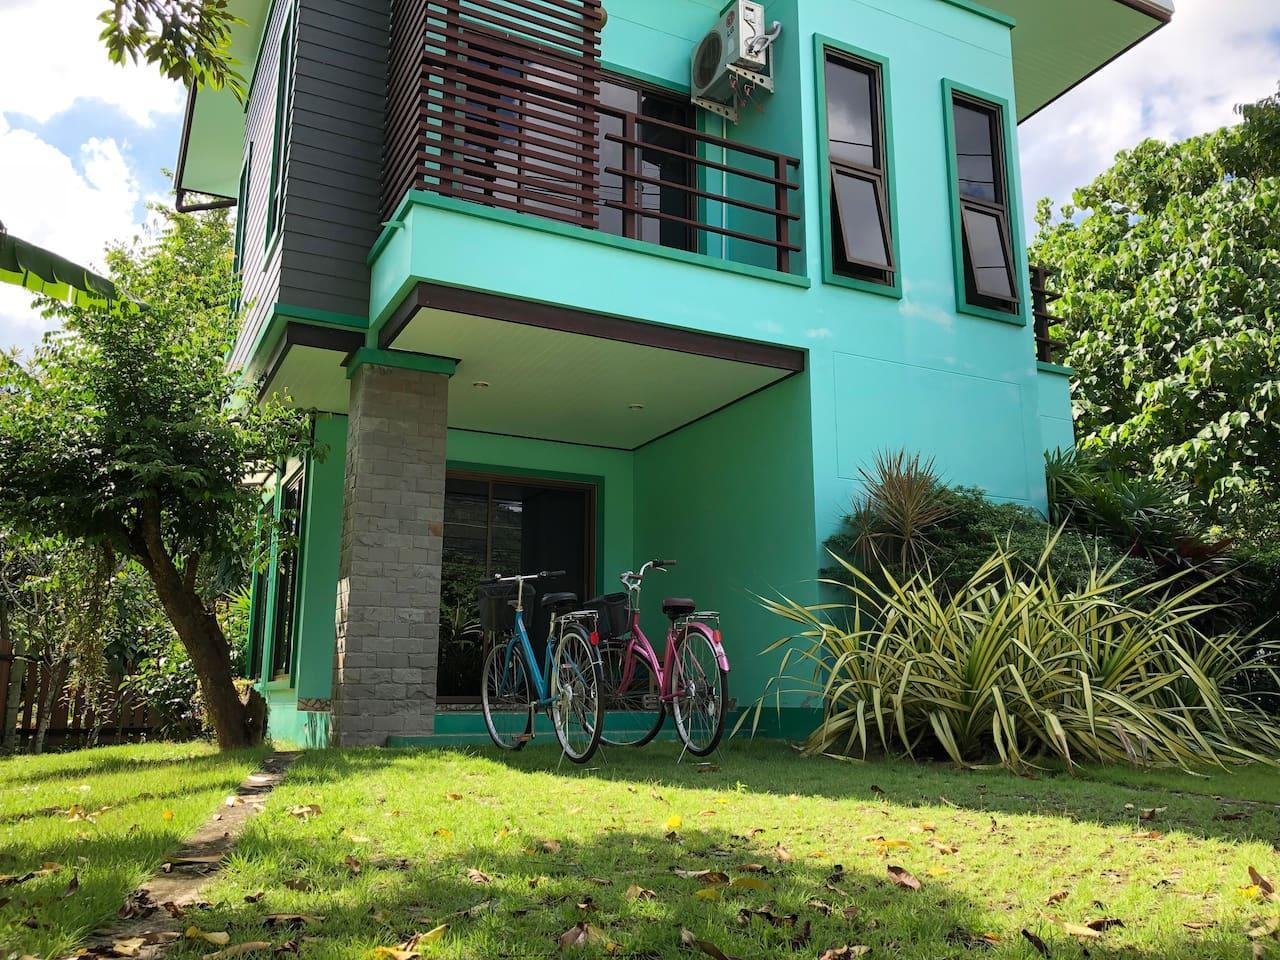 Private Green House with 2 bedrooms in Kamala บ้านเดี่ยว 2 ห้องนอน 2 ห้องน้ำส่วนตัว ขนาด 300 ตร.ม. – กมลา